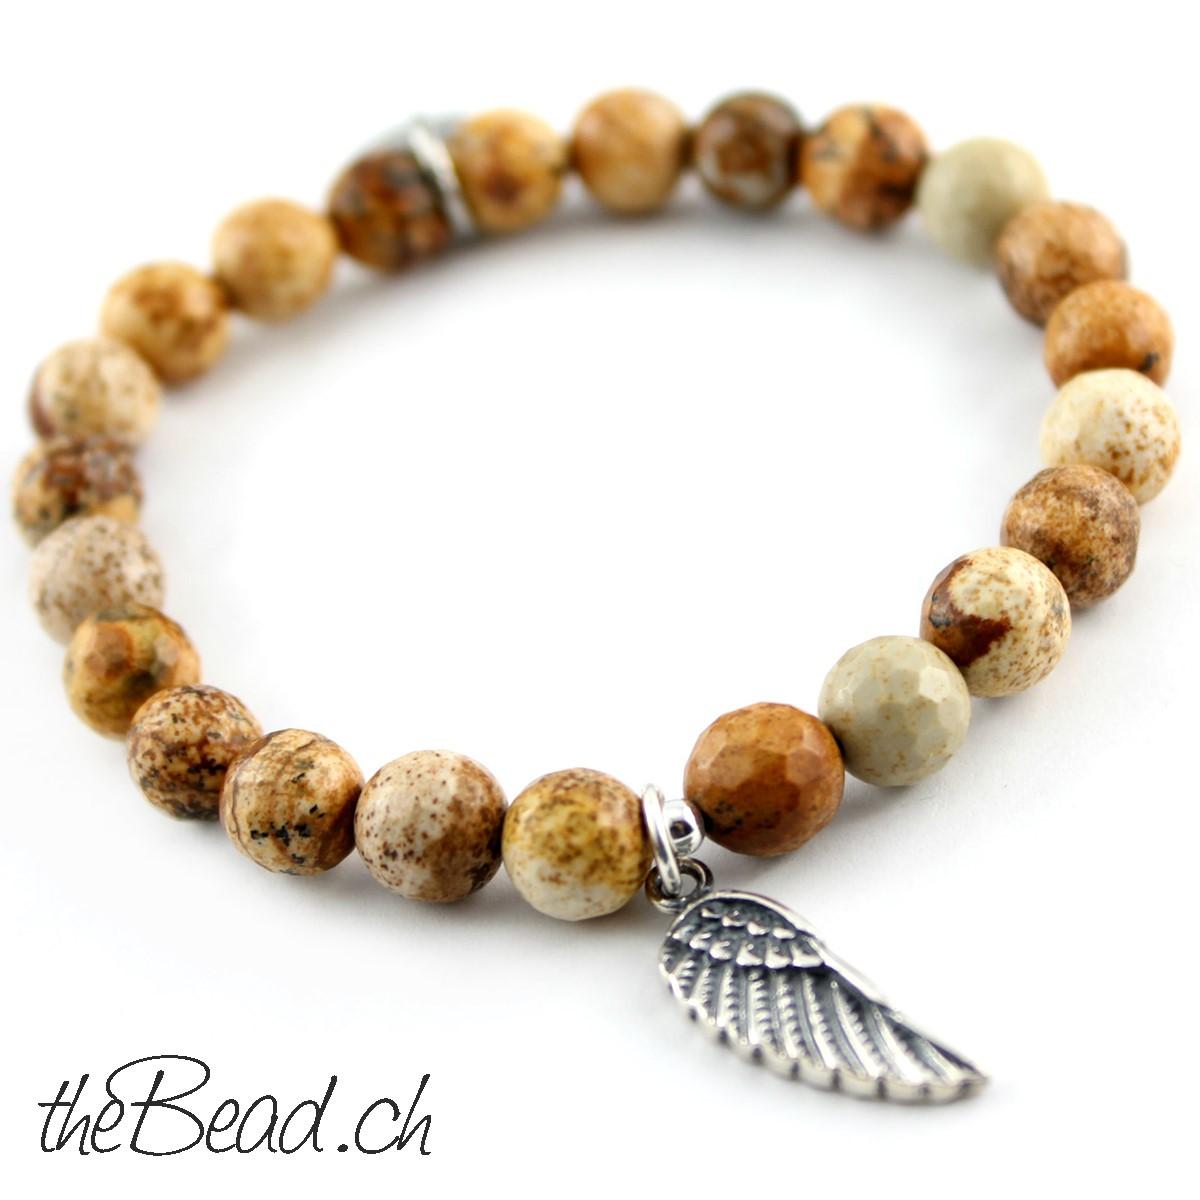 Schmuck schweiz  925 Silber Feder Perlenarmband-♥- Schmuck Geschenkidee kaufen